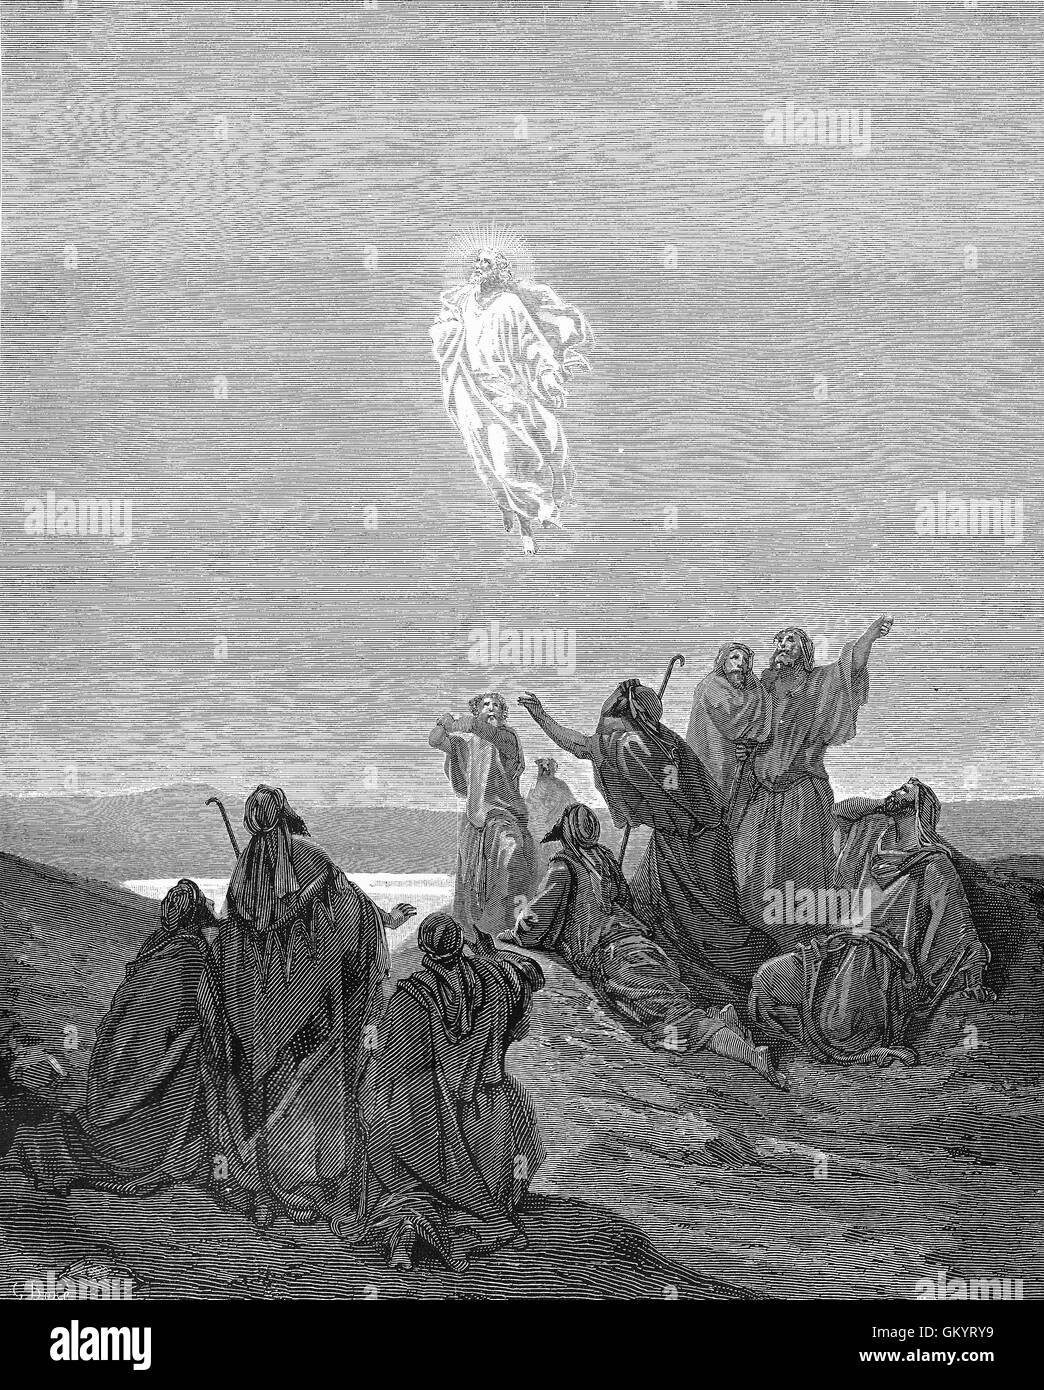 Gravur von Gustave Doré-Himmelfahrt Stockfoto